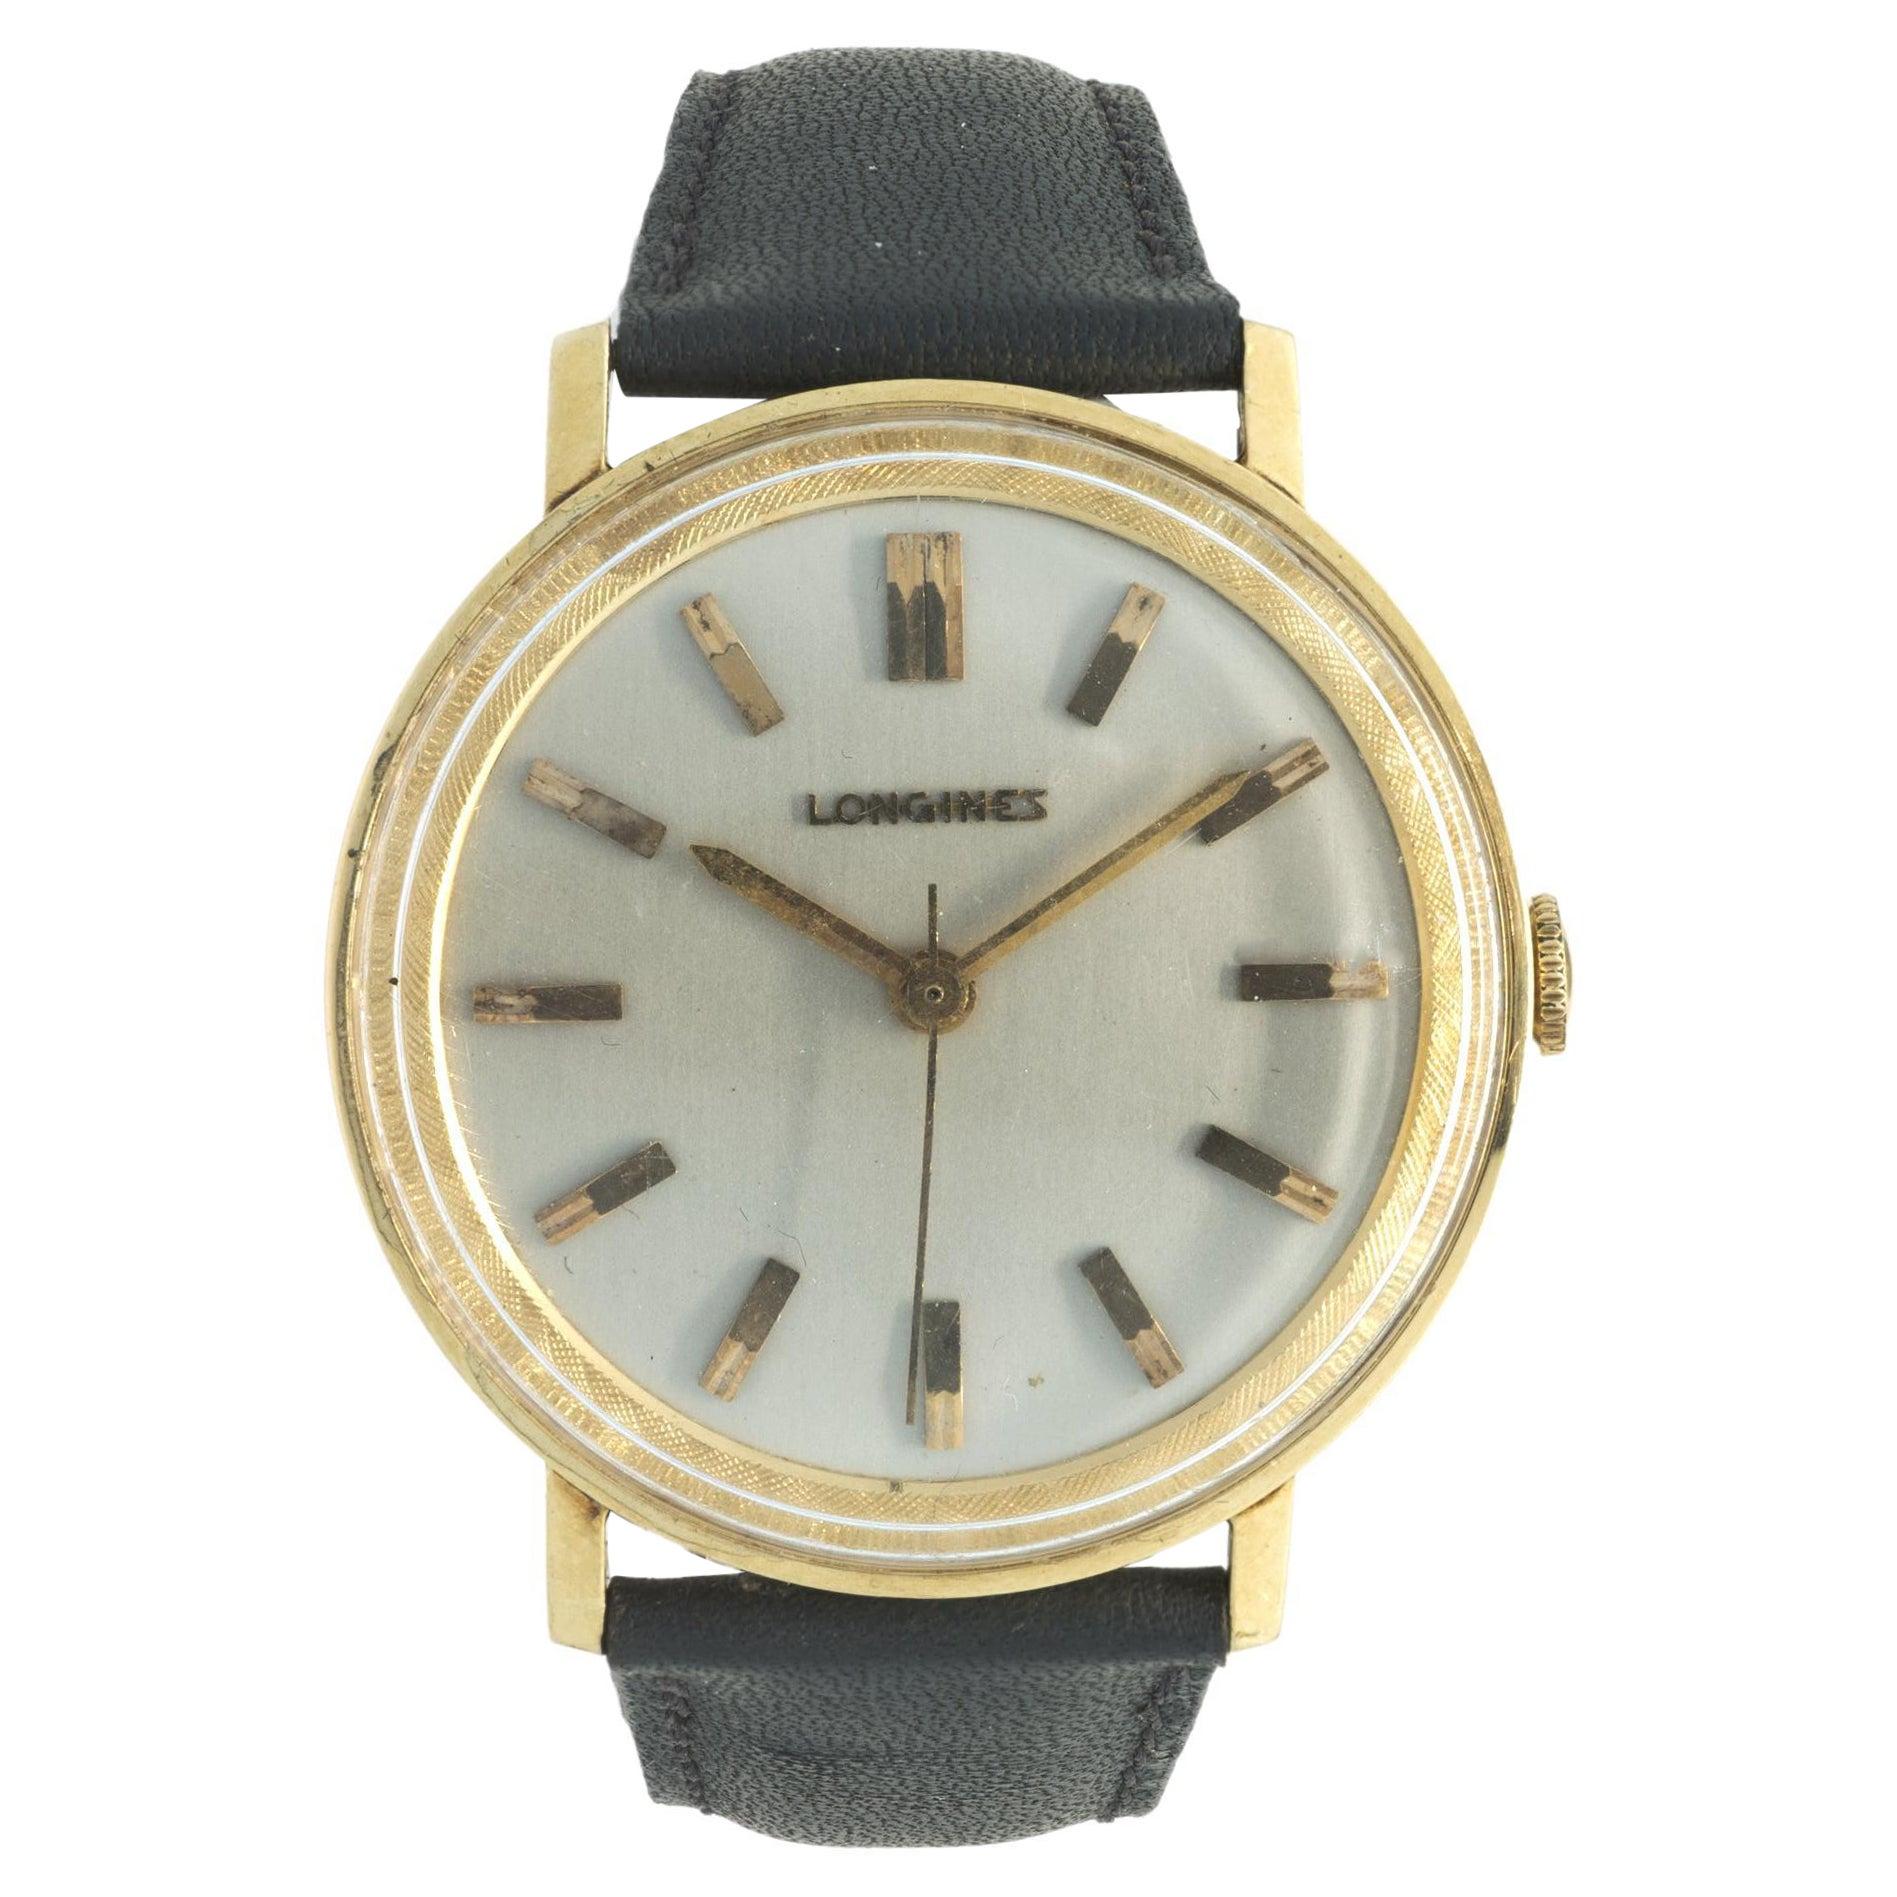 Longines 14 Karat Yellow Gold Vintage 1940-50's Wrist Watch